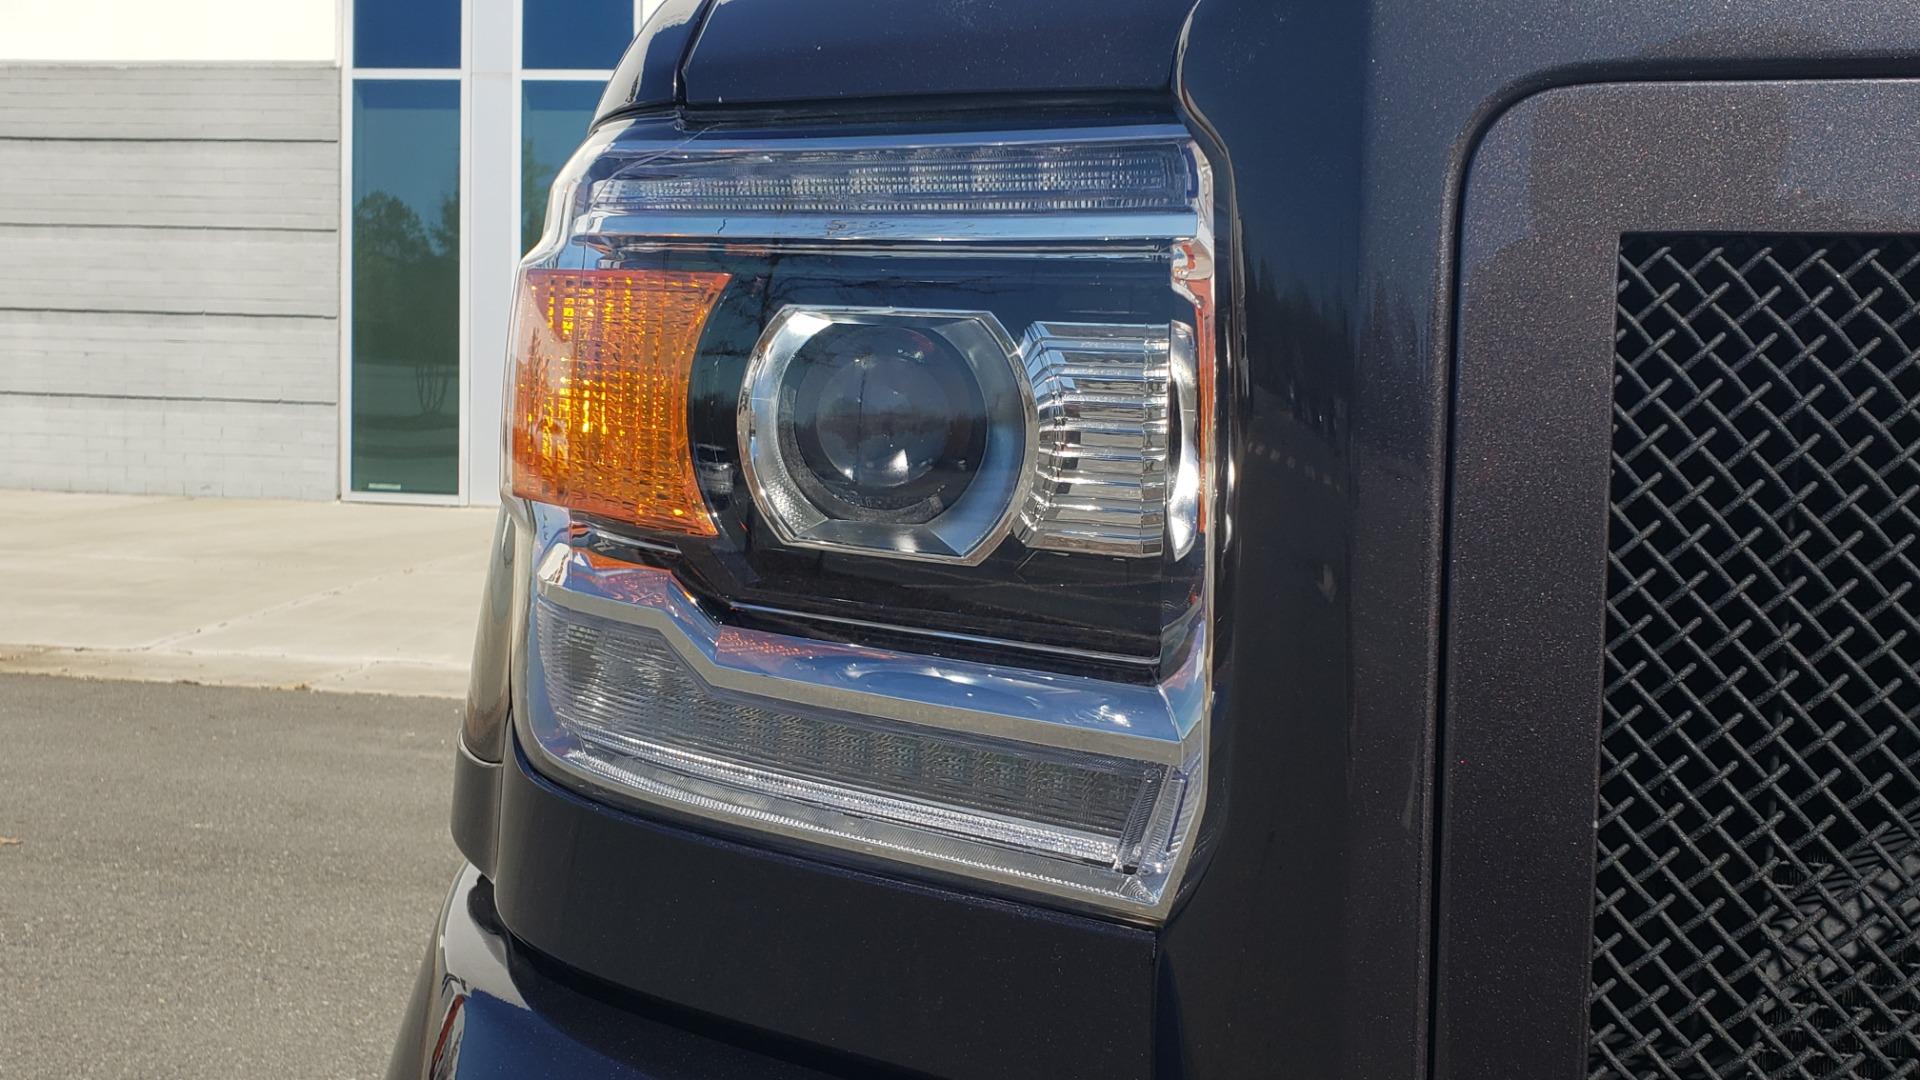 Used 2015 GMC SIERRA 2500HD DENALI 4WD CREWCAB / 6.6L DURAMAX / 6-SPD AUTO / NAV / BOSE for sale $50,995 at Formula Imports in Charlotte NC 28227 24